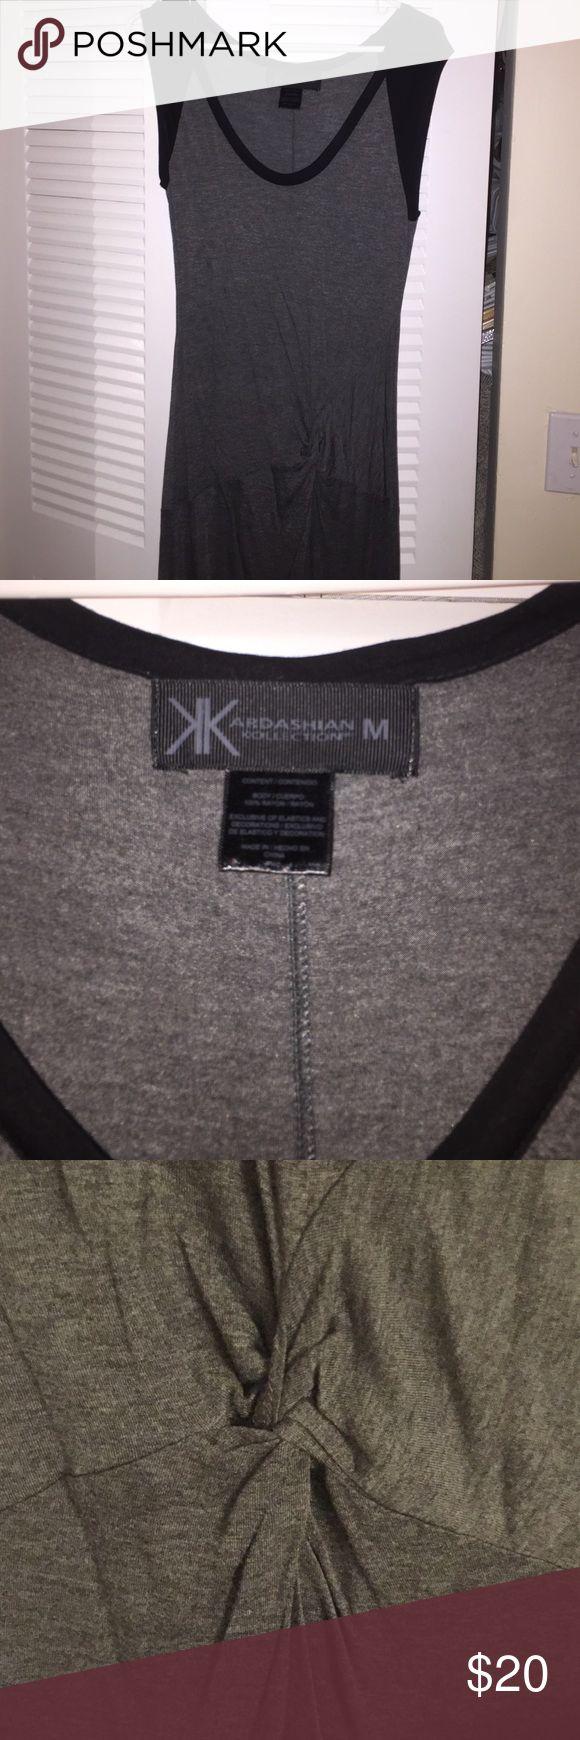 Kardashian Kollection women's gray midi dress M Kardashian Kollection women's gray short sleeve colorblock dress. Knotted center. Midi length. Women's sz M. Brand new, never worn without original tags. Fast shipping!  Kardashian Kollection Dresses Midi